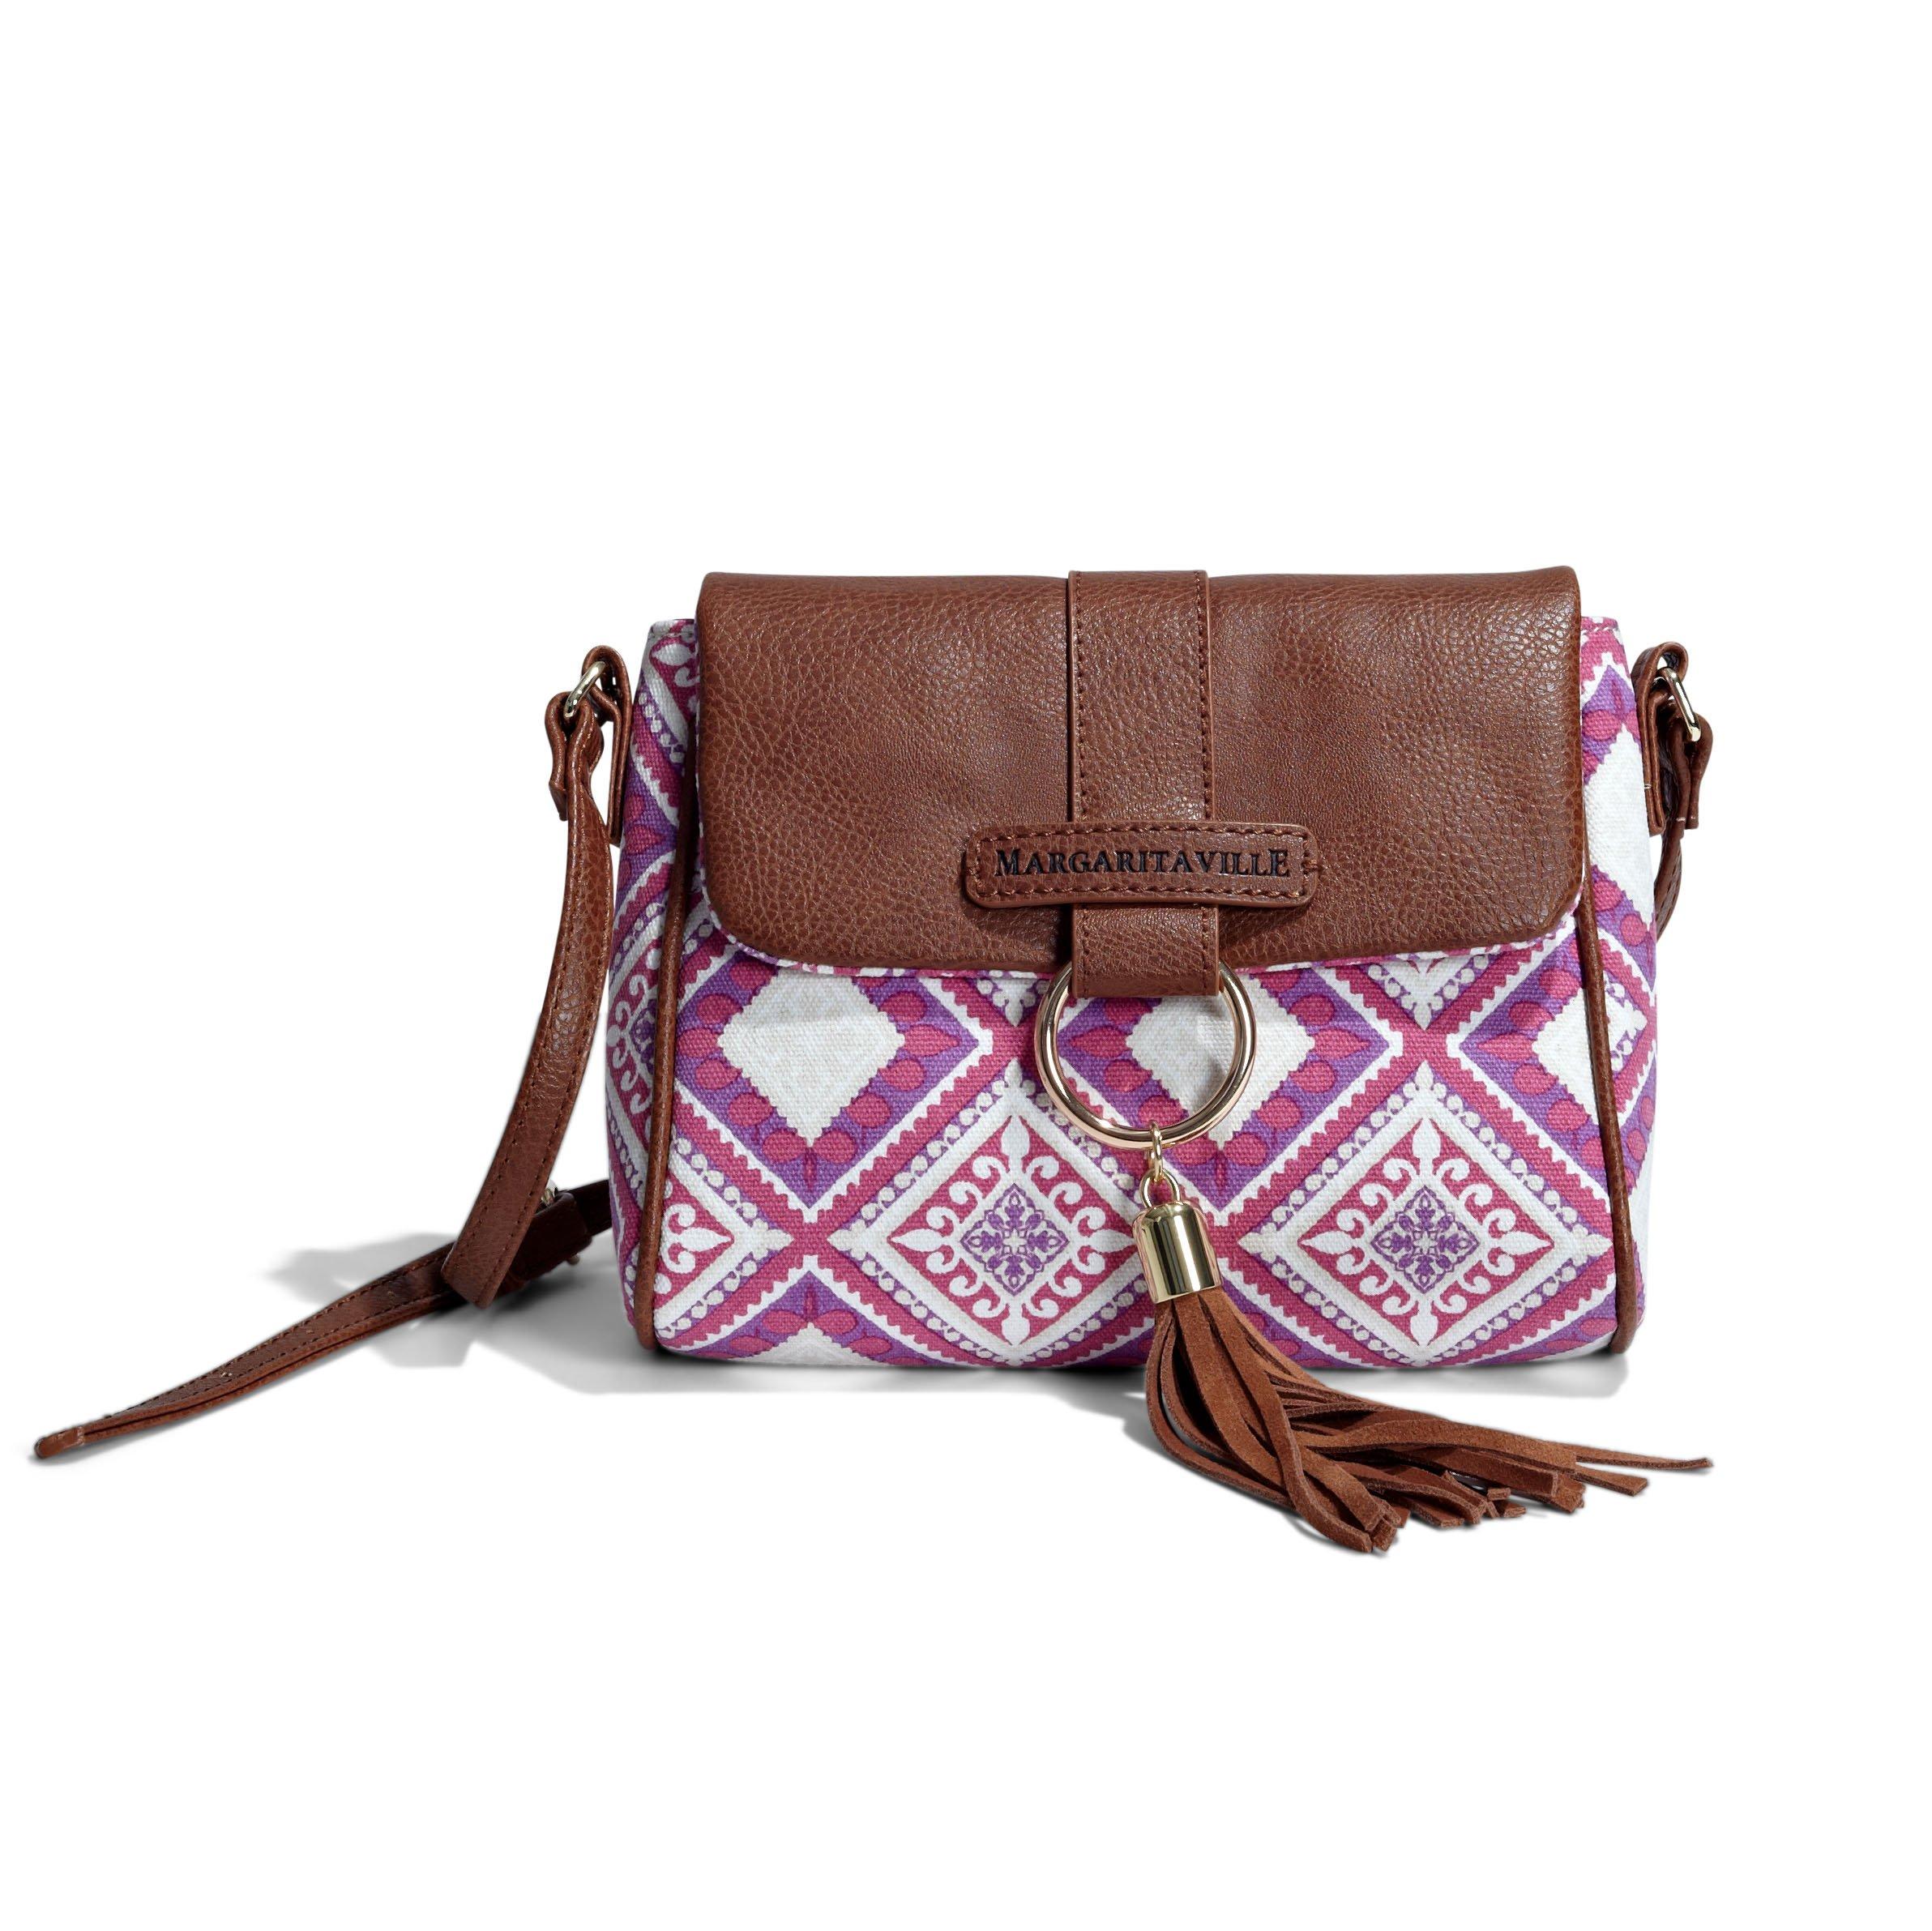 Margaritaville Womens Girls Carry Away Flap Crossbody Shoulder Bag Mosaic Fuchsia